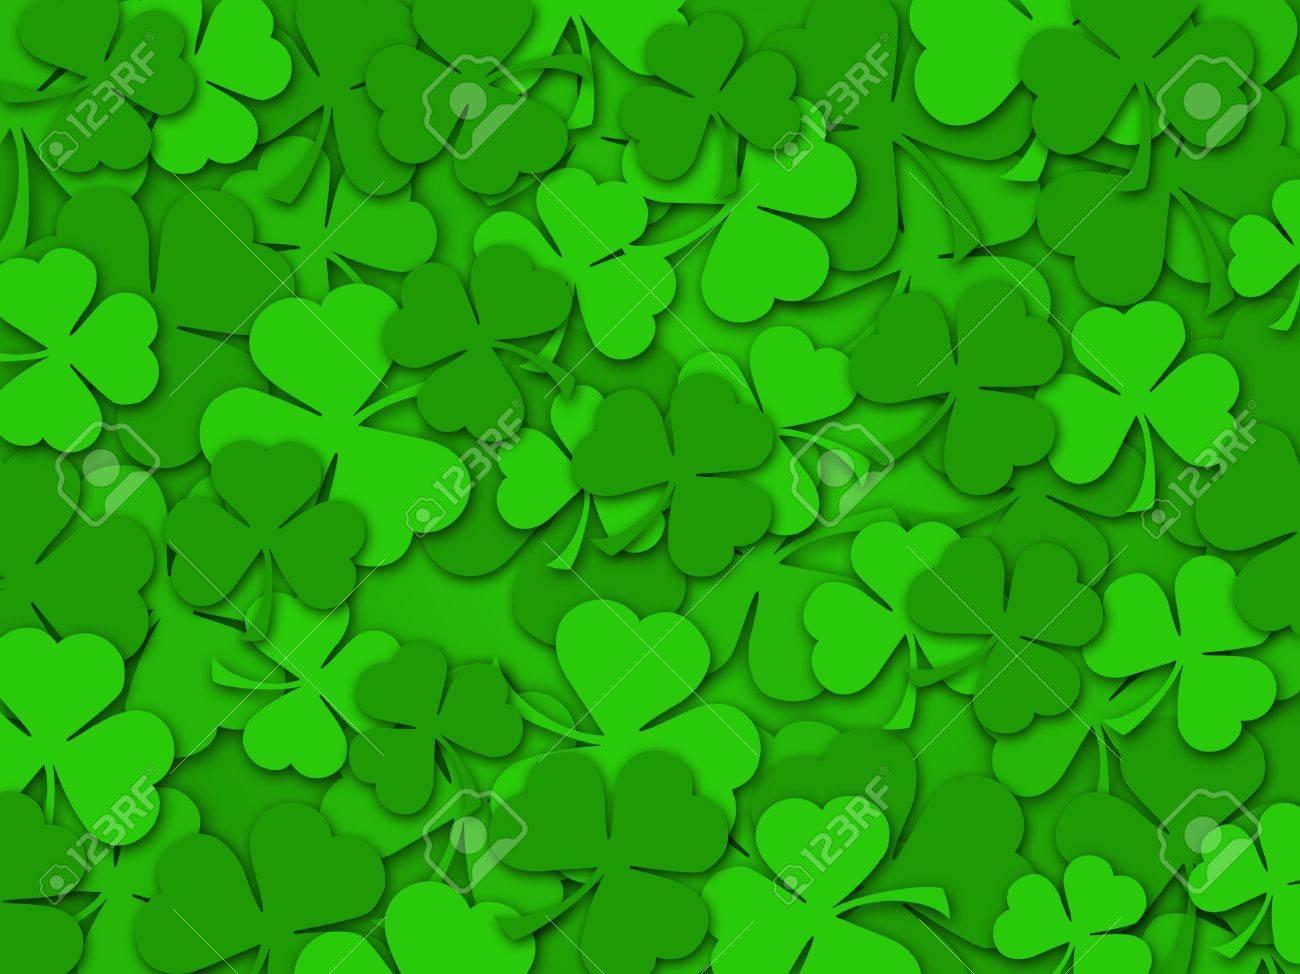 happy st patrick u0027s day green shamrock leaves background color